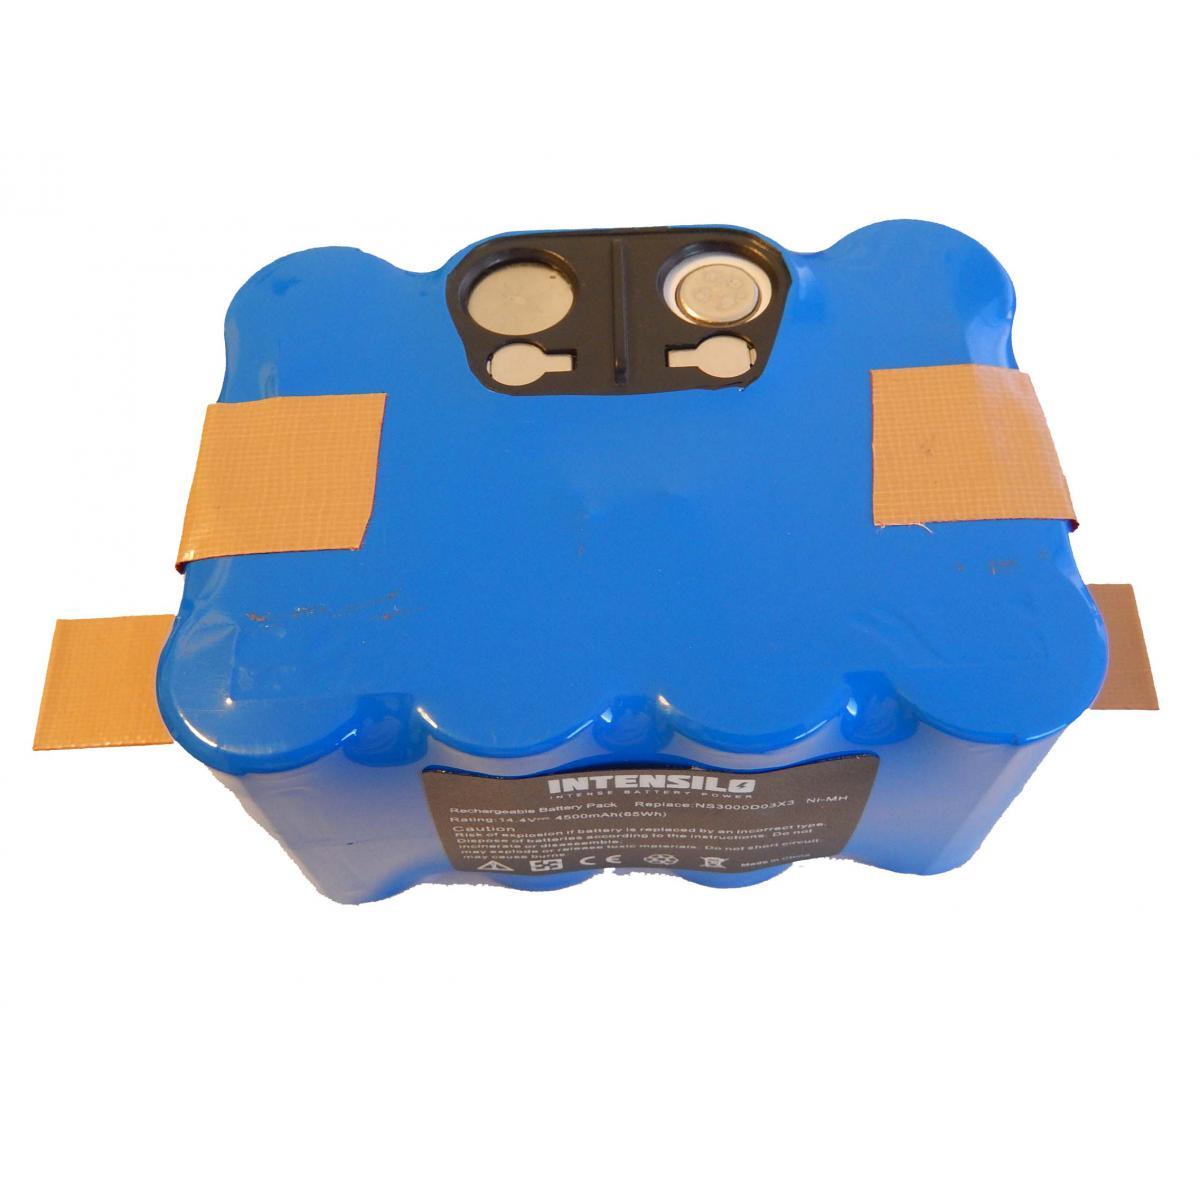 Vhbw INTENSILO Batterie NiMH 4500mAh (14.4V) pour aspirateur robot E.Ziclean Furtiv comme NS3000D03X3, YX-Ni-MH-022144.